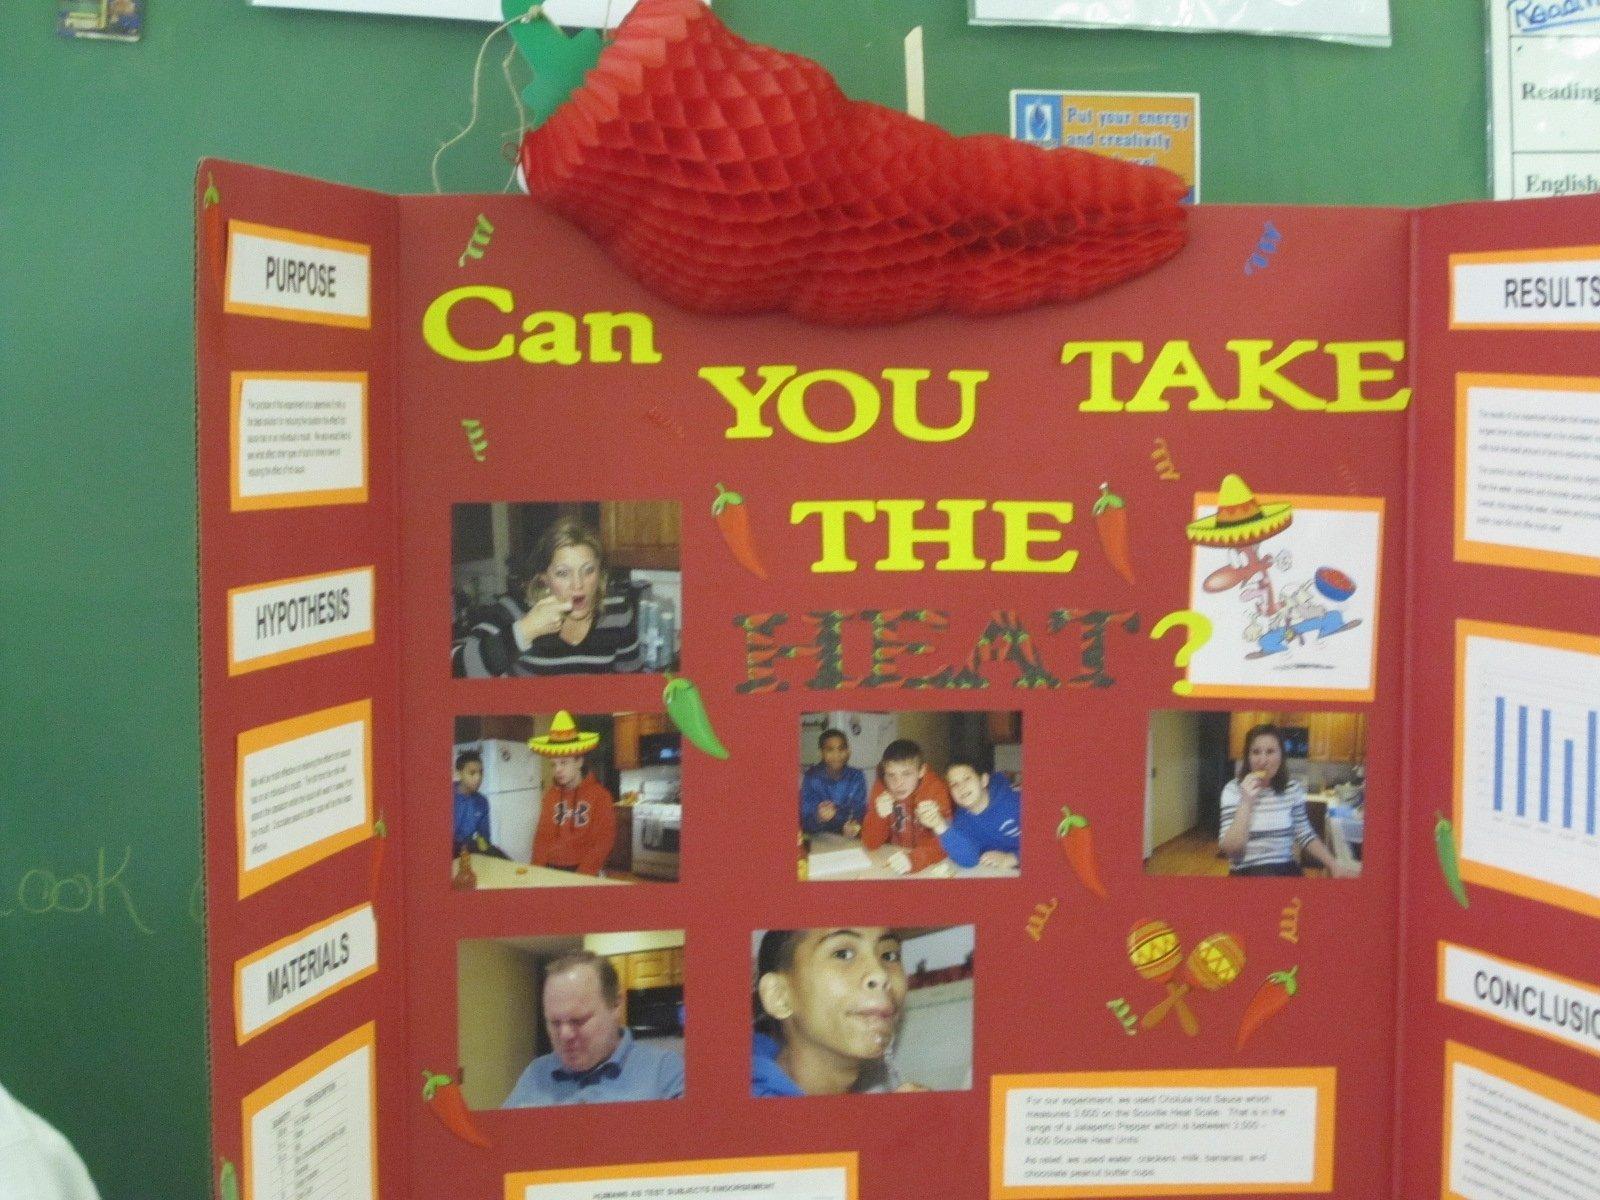 10 Pretty Science Fair Ideas For 8Th Grade cool science fair projects for 8th graders custom paper service 5 2020